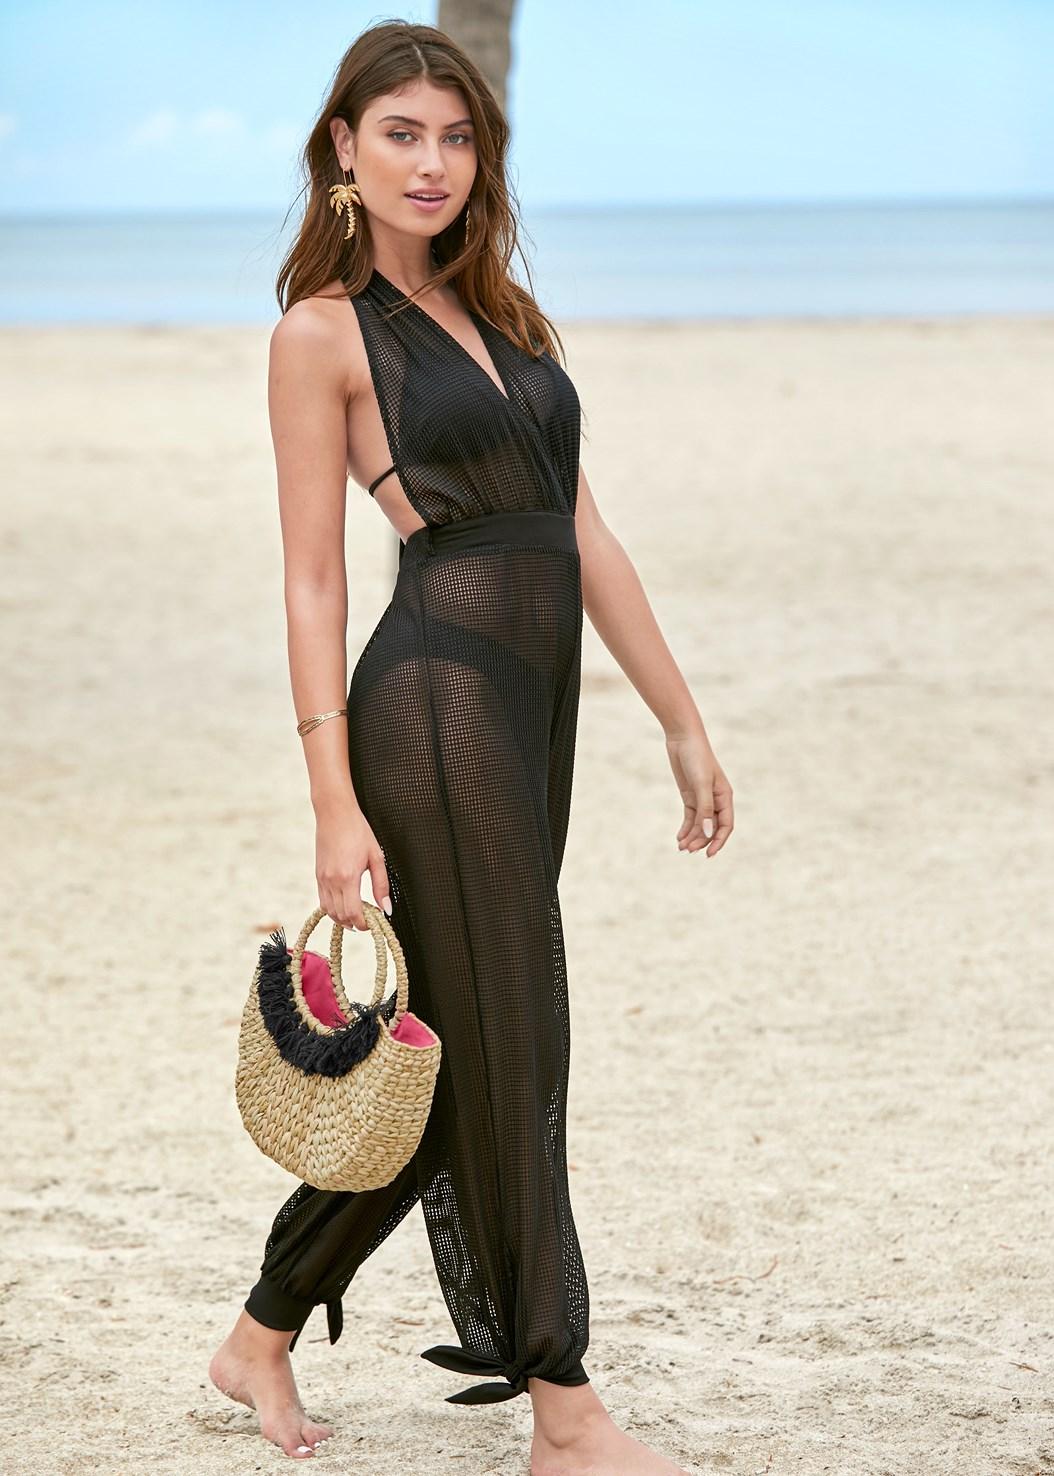 Jersey Fishnet Jumpsuit,Triangle Bikini Top,Scoop Front Bikini Bottom,Low Rise Bikini Bottom,Woven Handbag